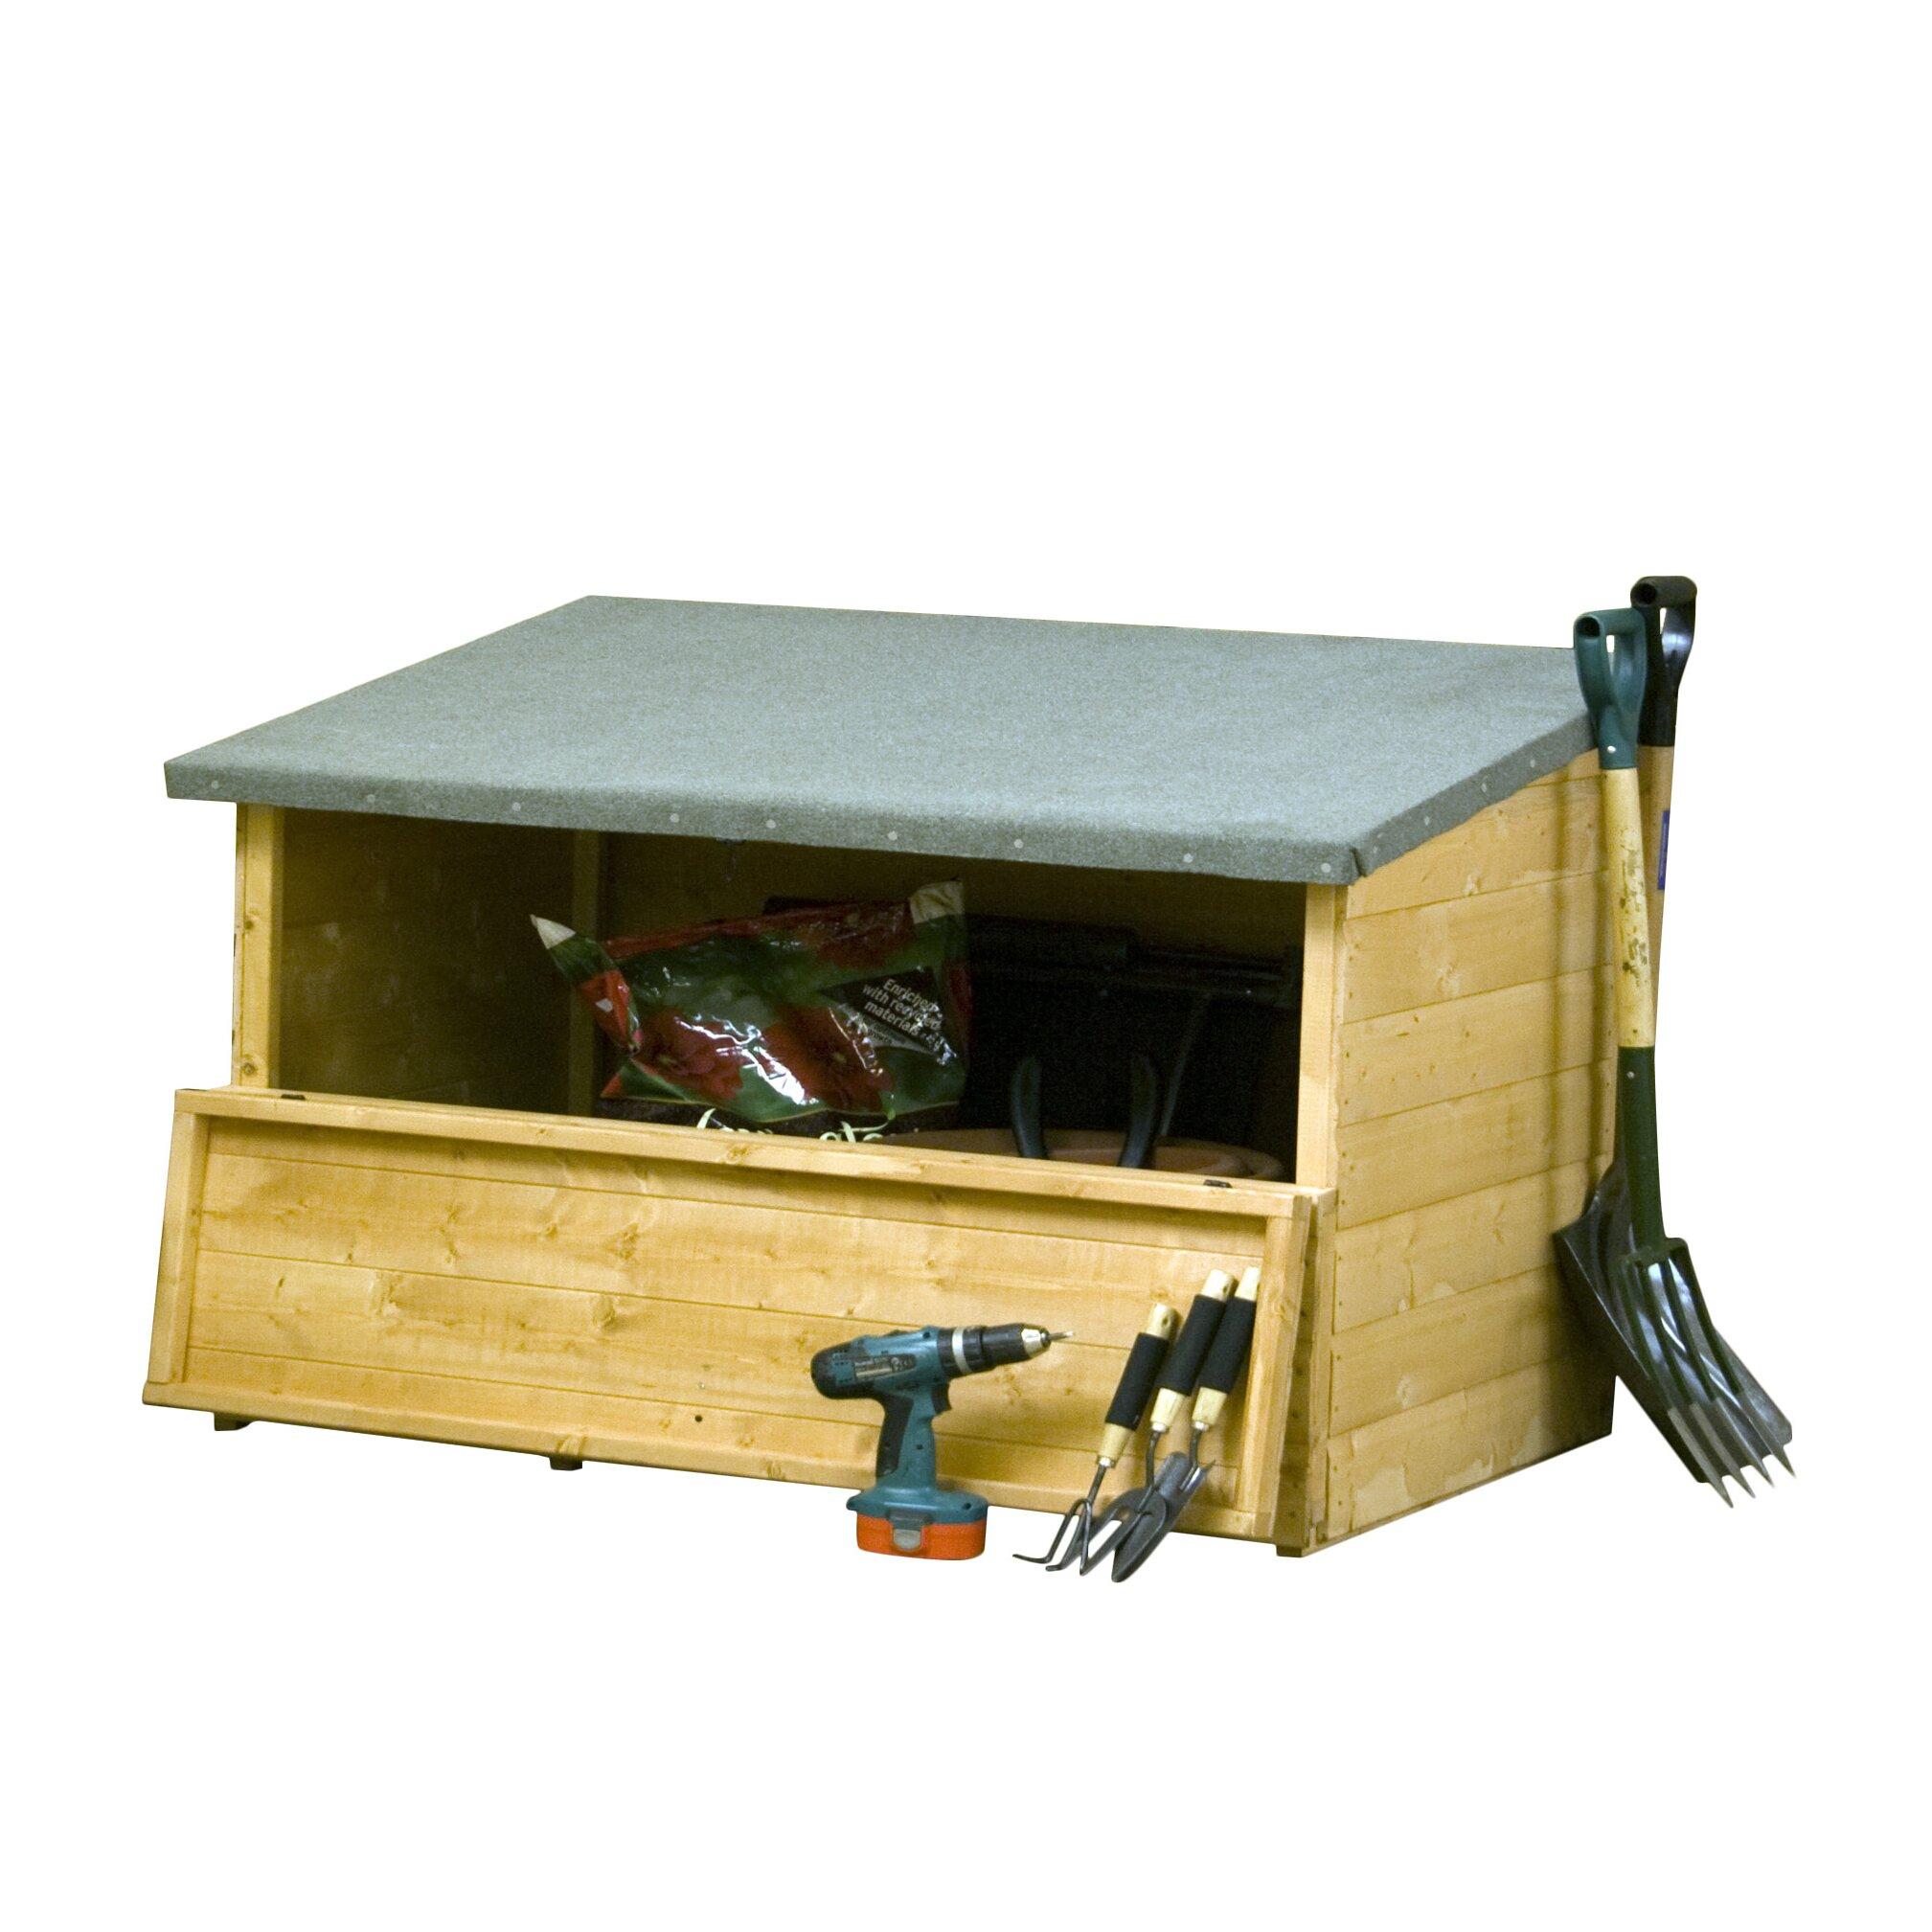 Mercia garden products shiplap garden 4 x 2 7 wooden tool for Garden shed 4 x 2